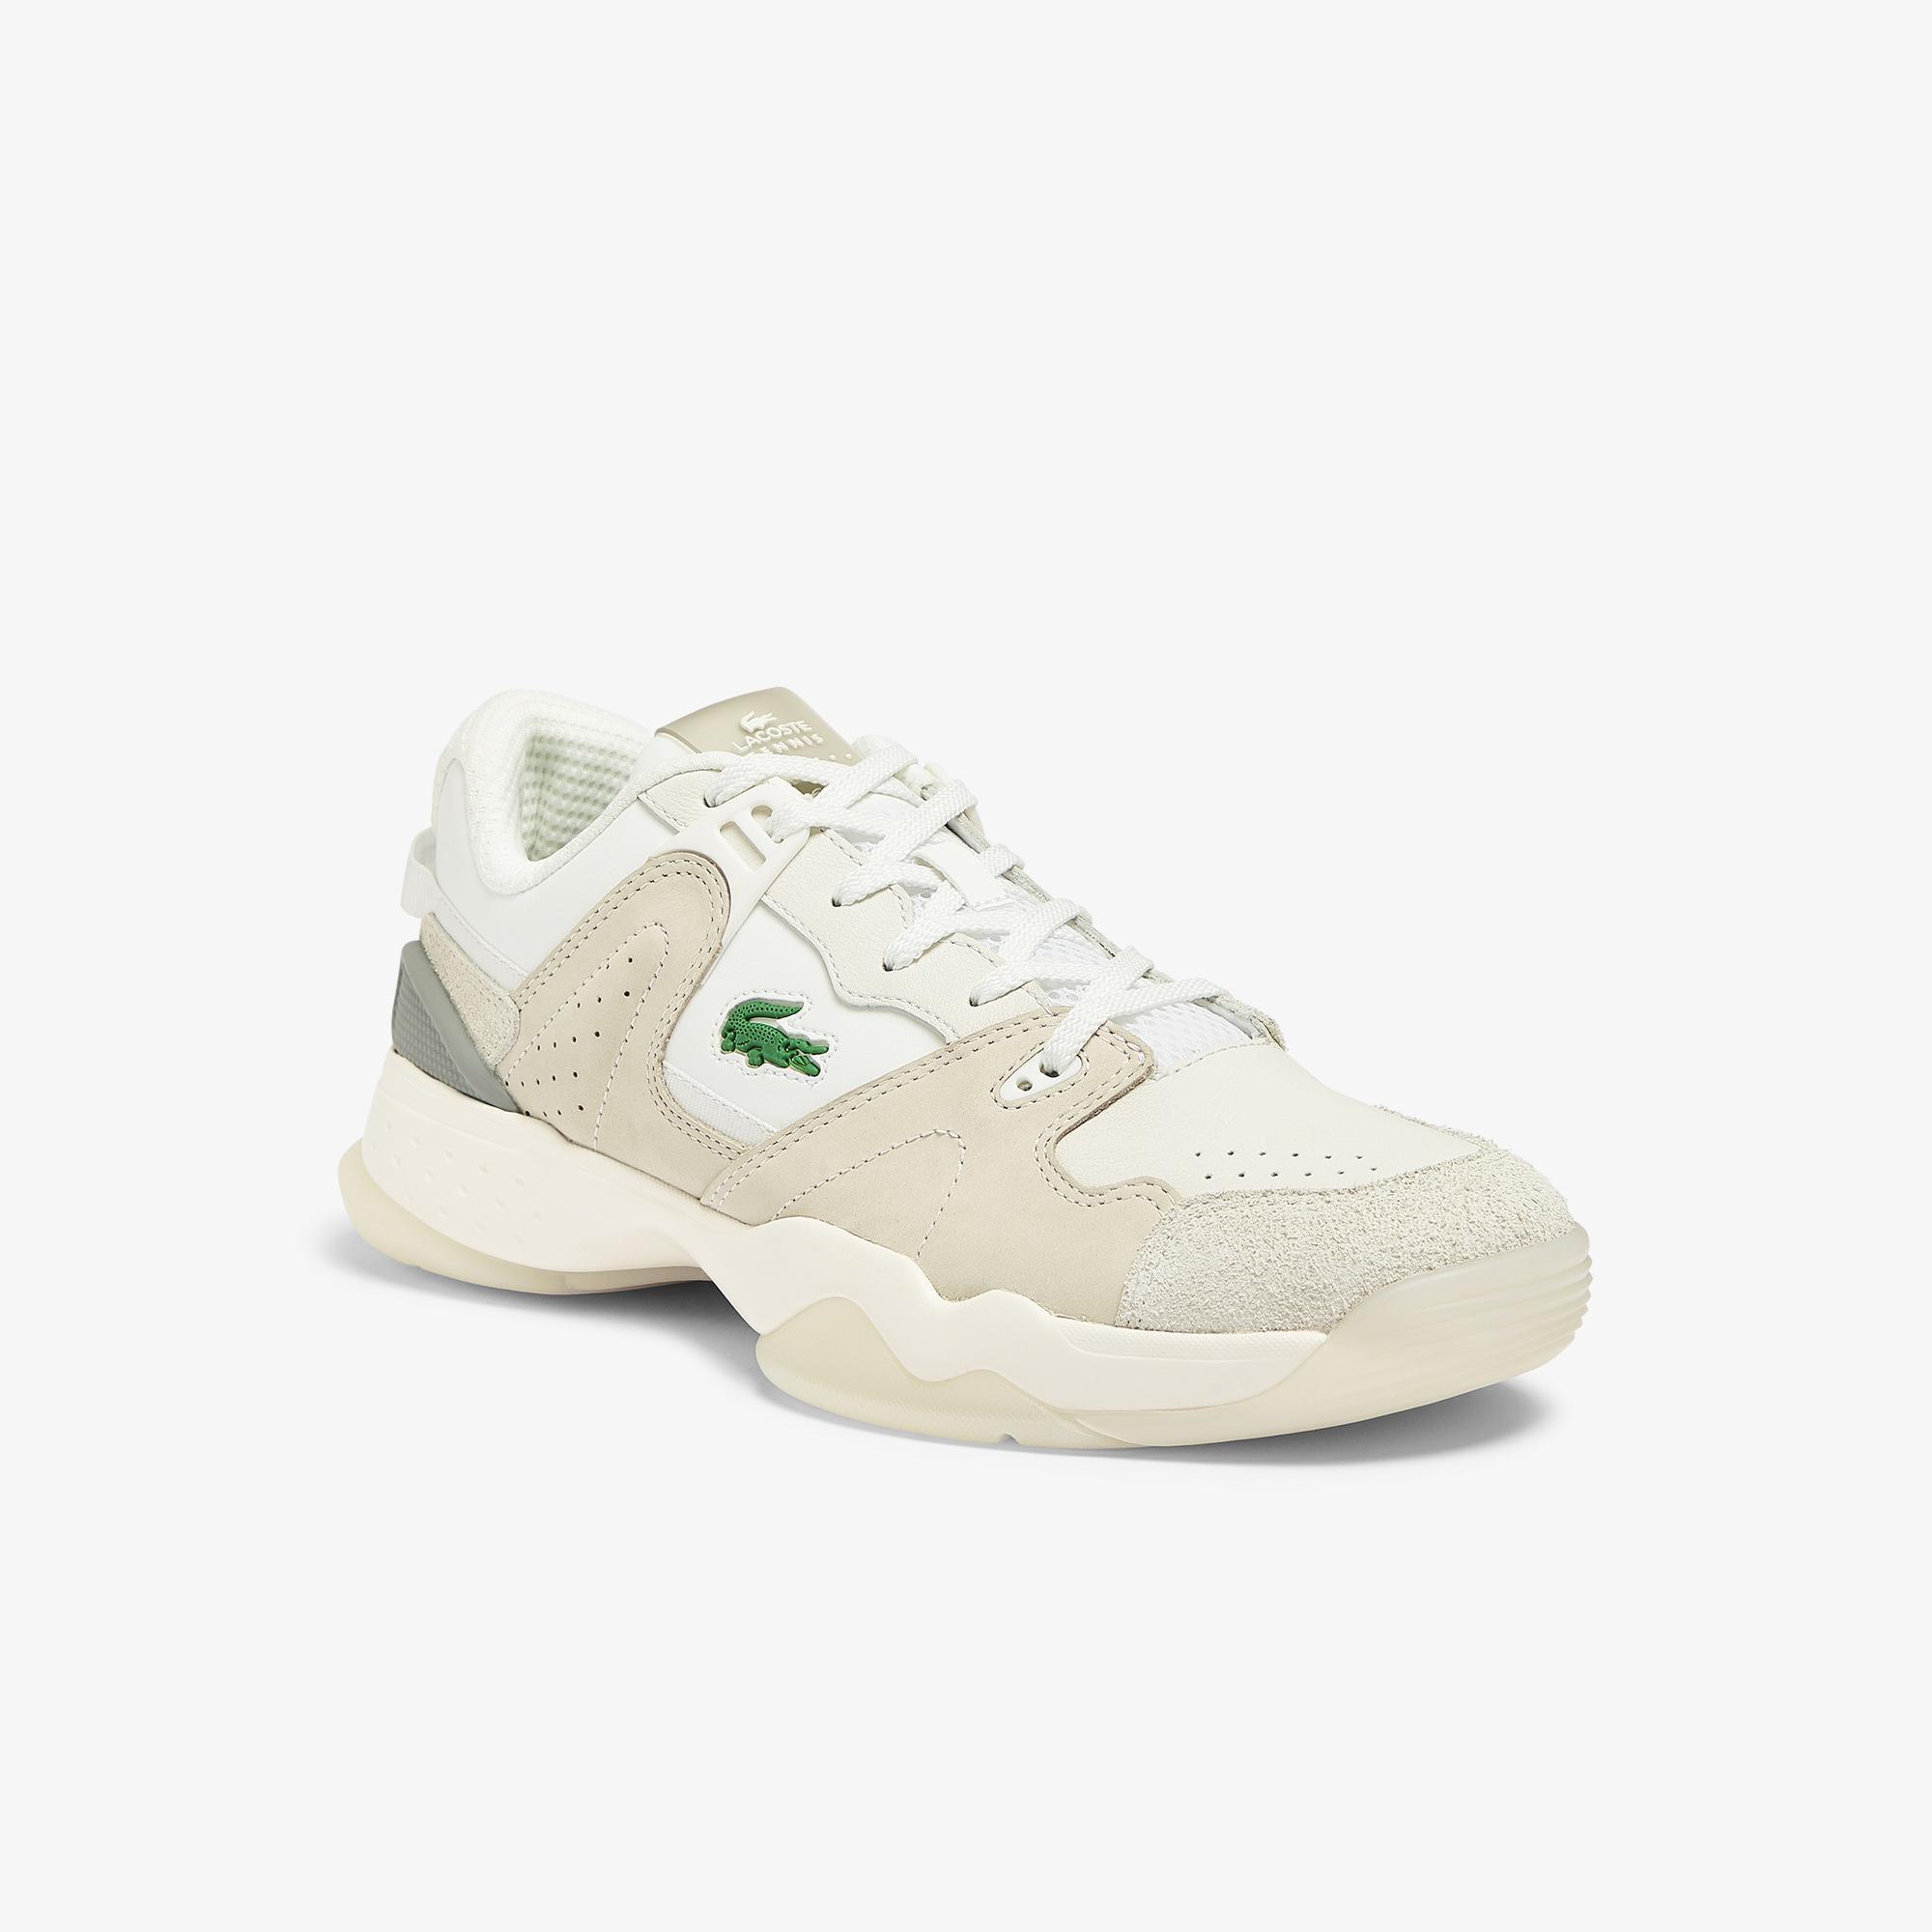 Lacoste Men'St-Poınt 0721 1 G Sma Shoes